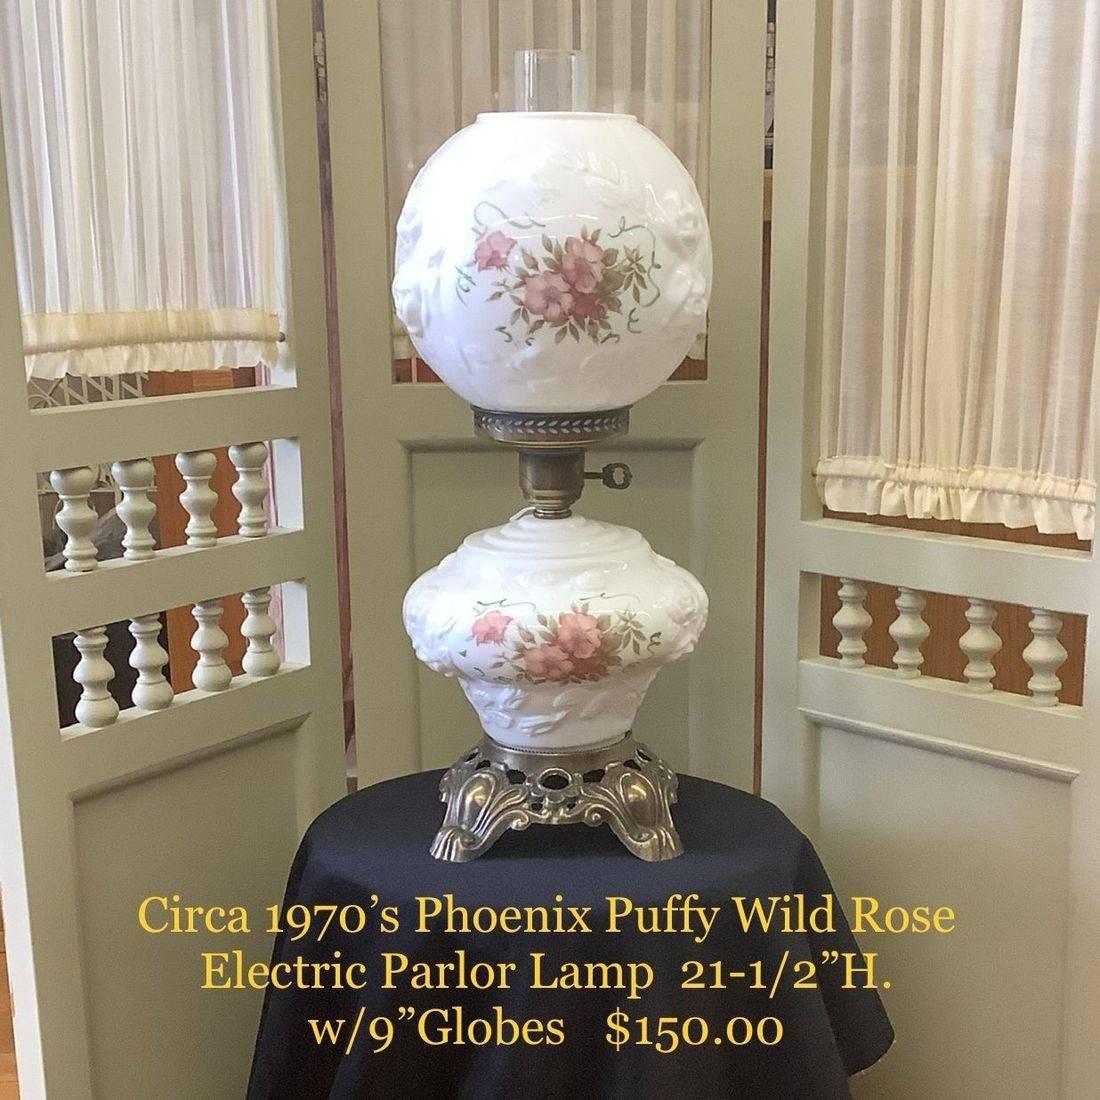 C. 1970's Phoenix Puffy Wild Rose Electric Parlor Lamp $150.00